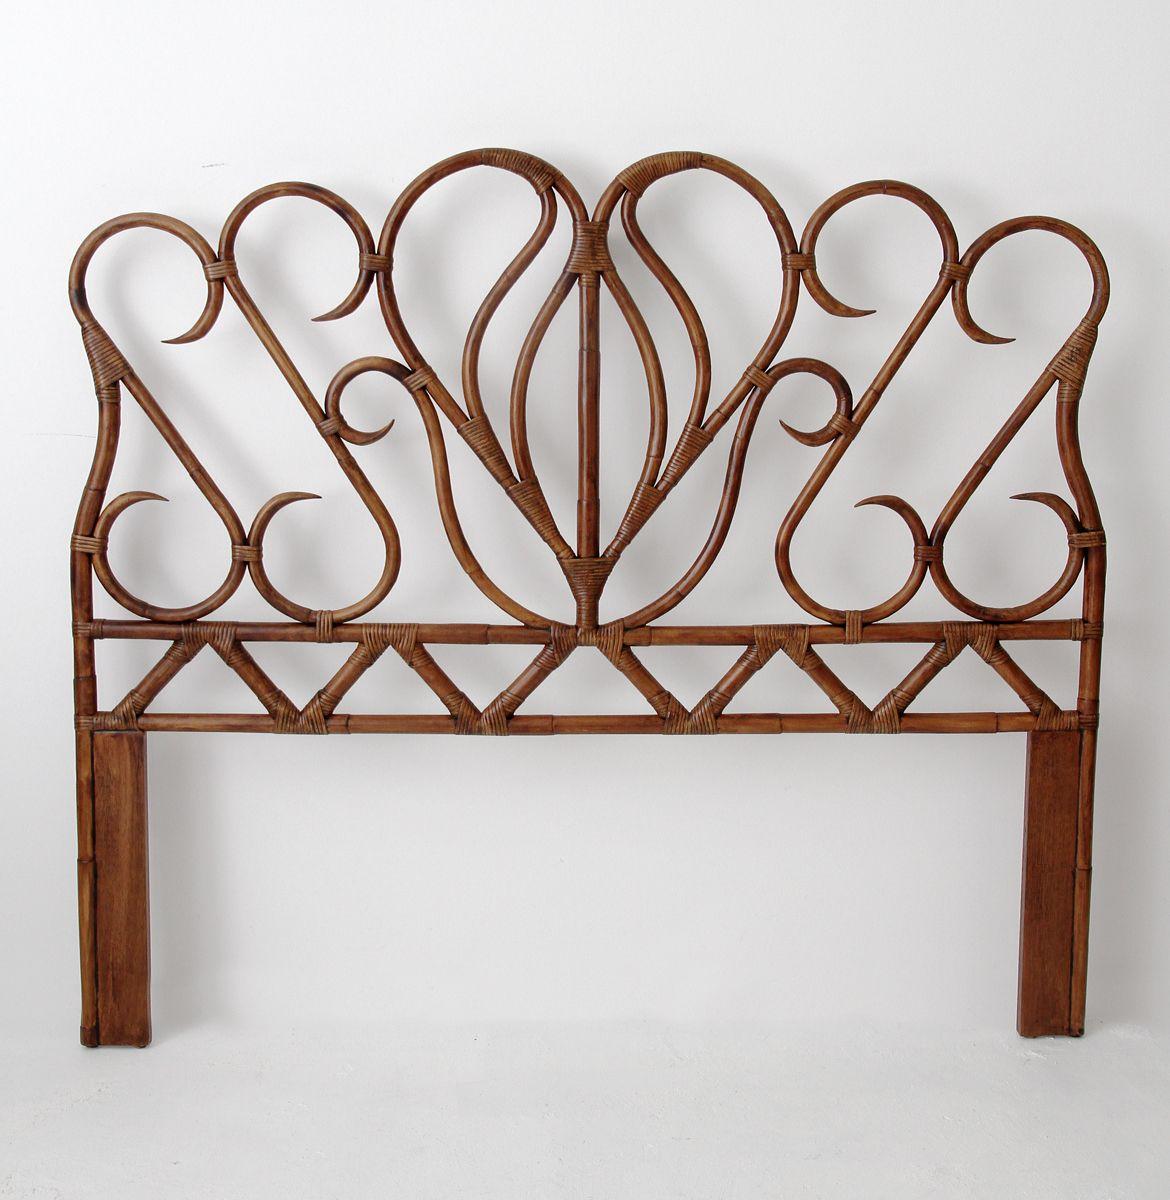 baroque cane headboard  rattan and wicker furniture australia  - baroque cane headboard  rattan and wicker furniture australia